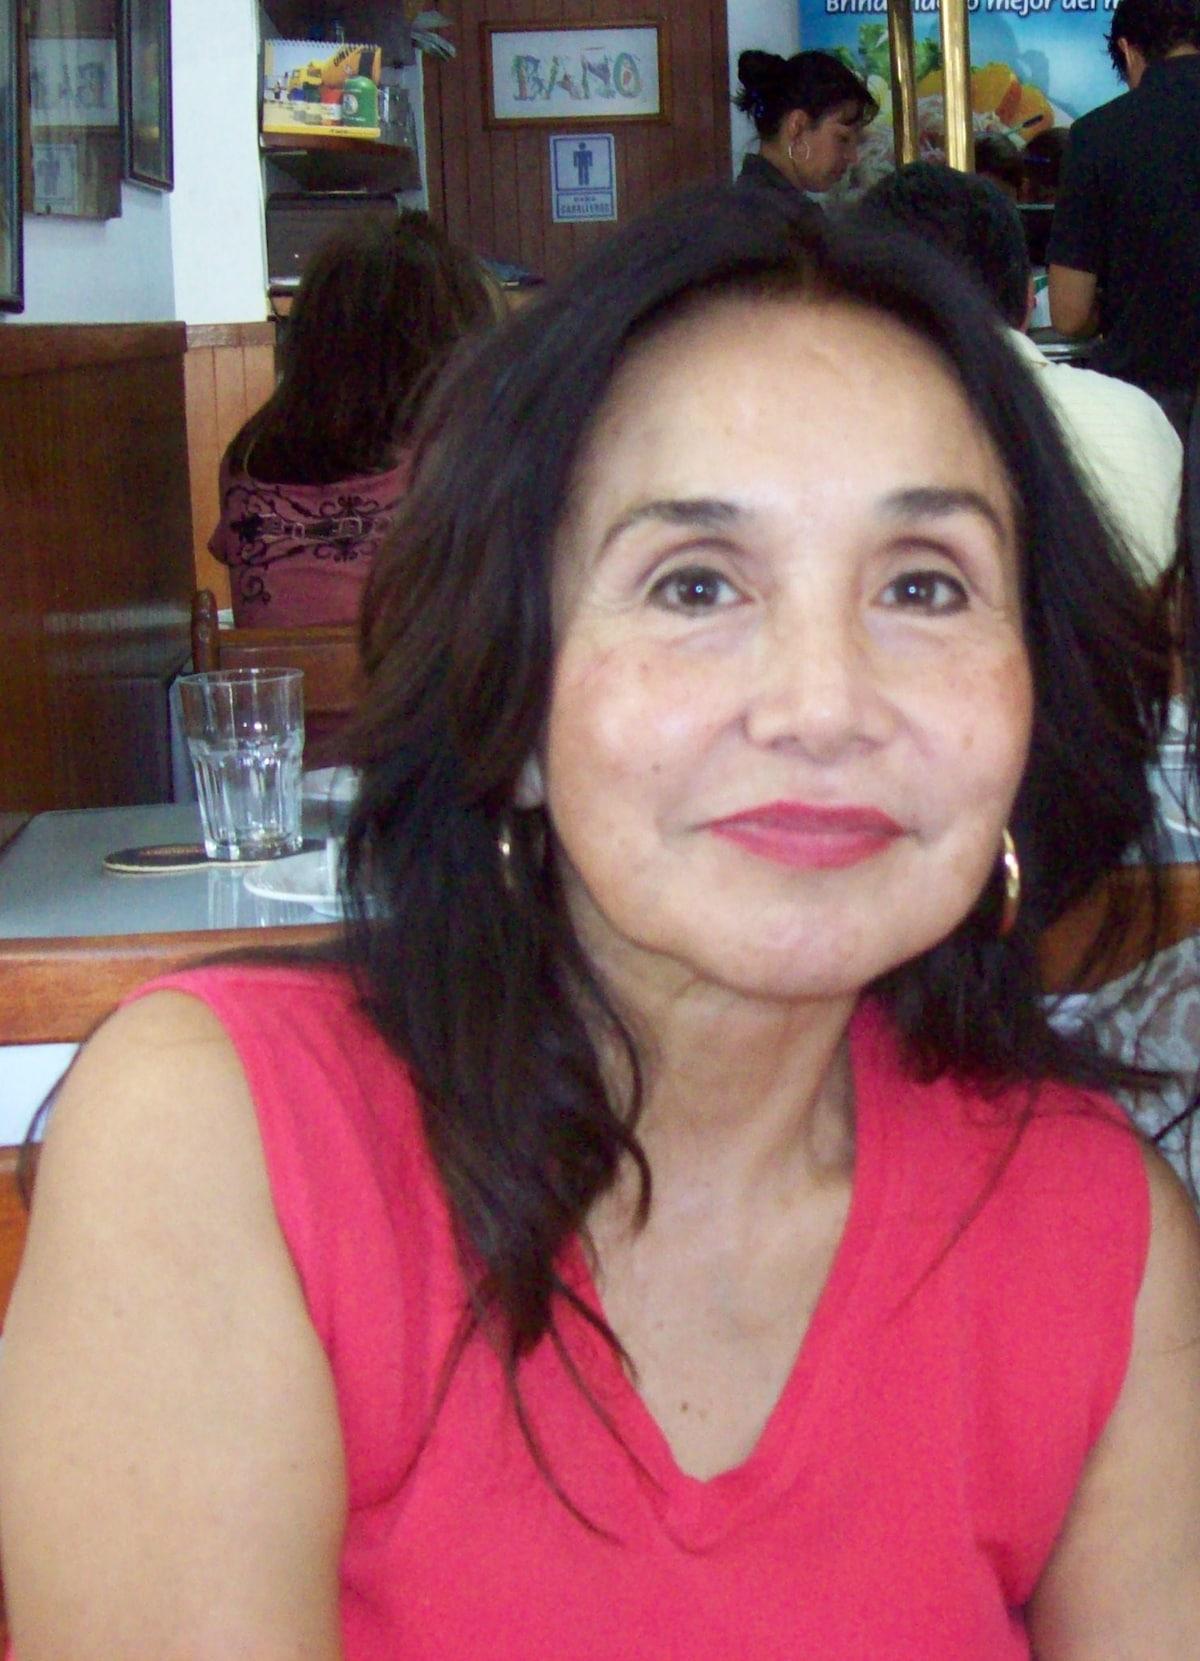 Carmen from Miraflores